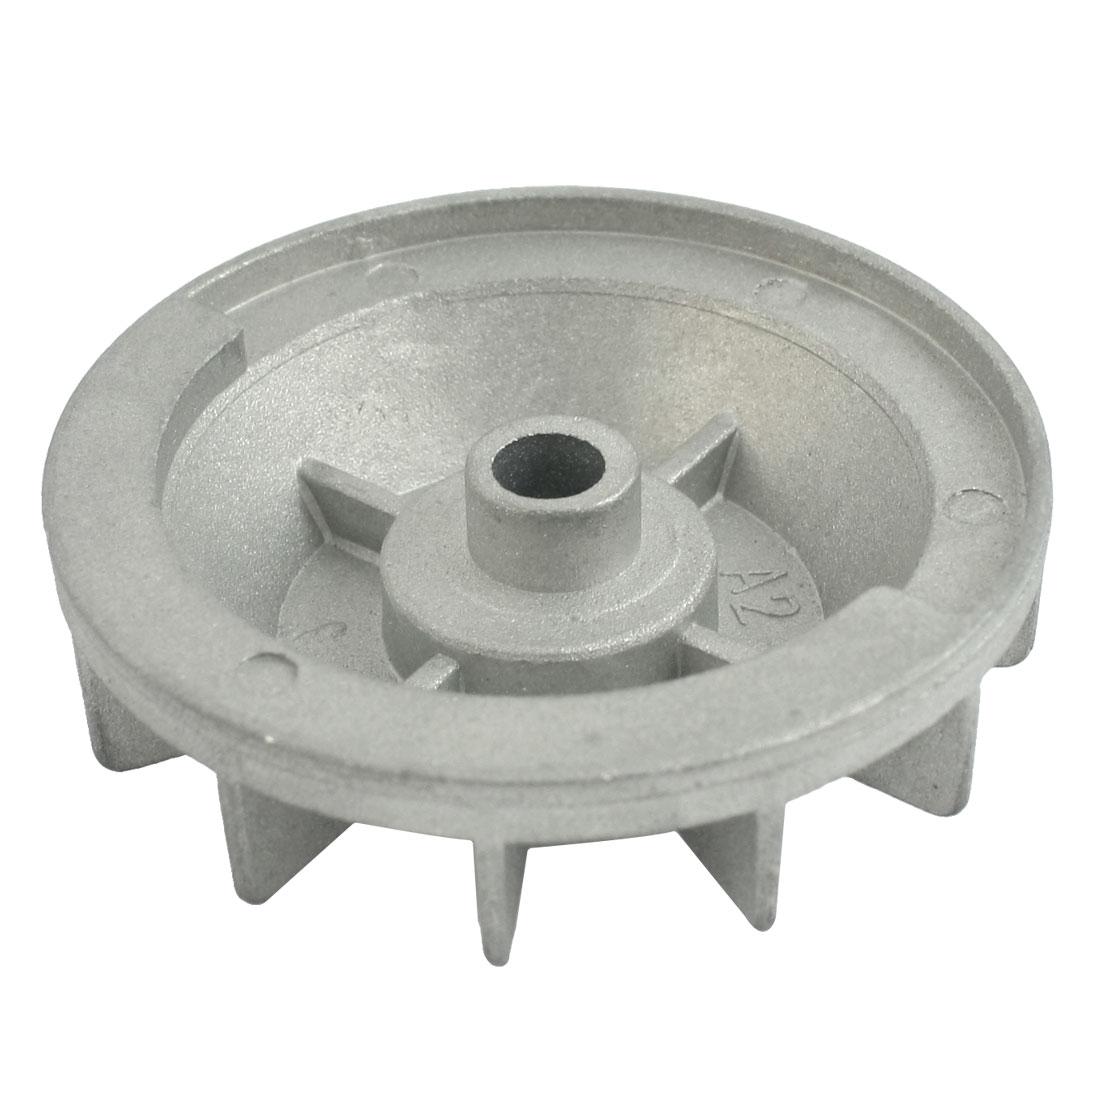 68mm Dia 12 Vanes Silver Tone Aluminium Motor Vane for Makita 4510 Sander